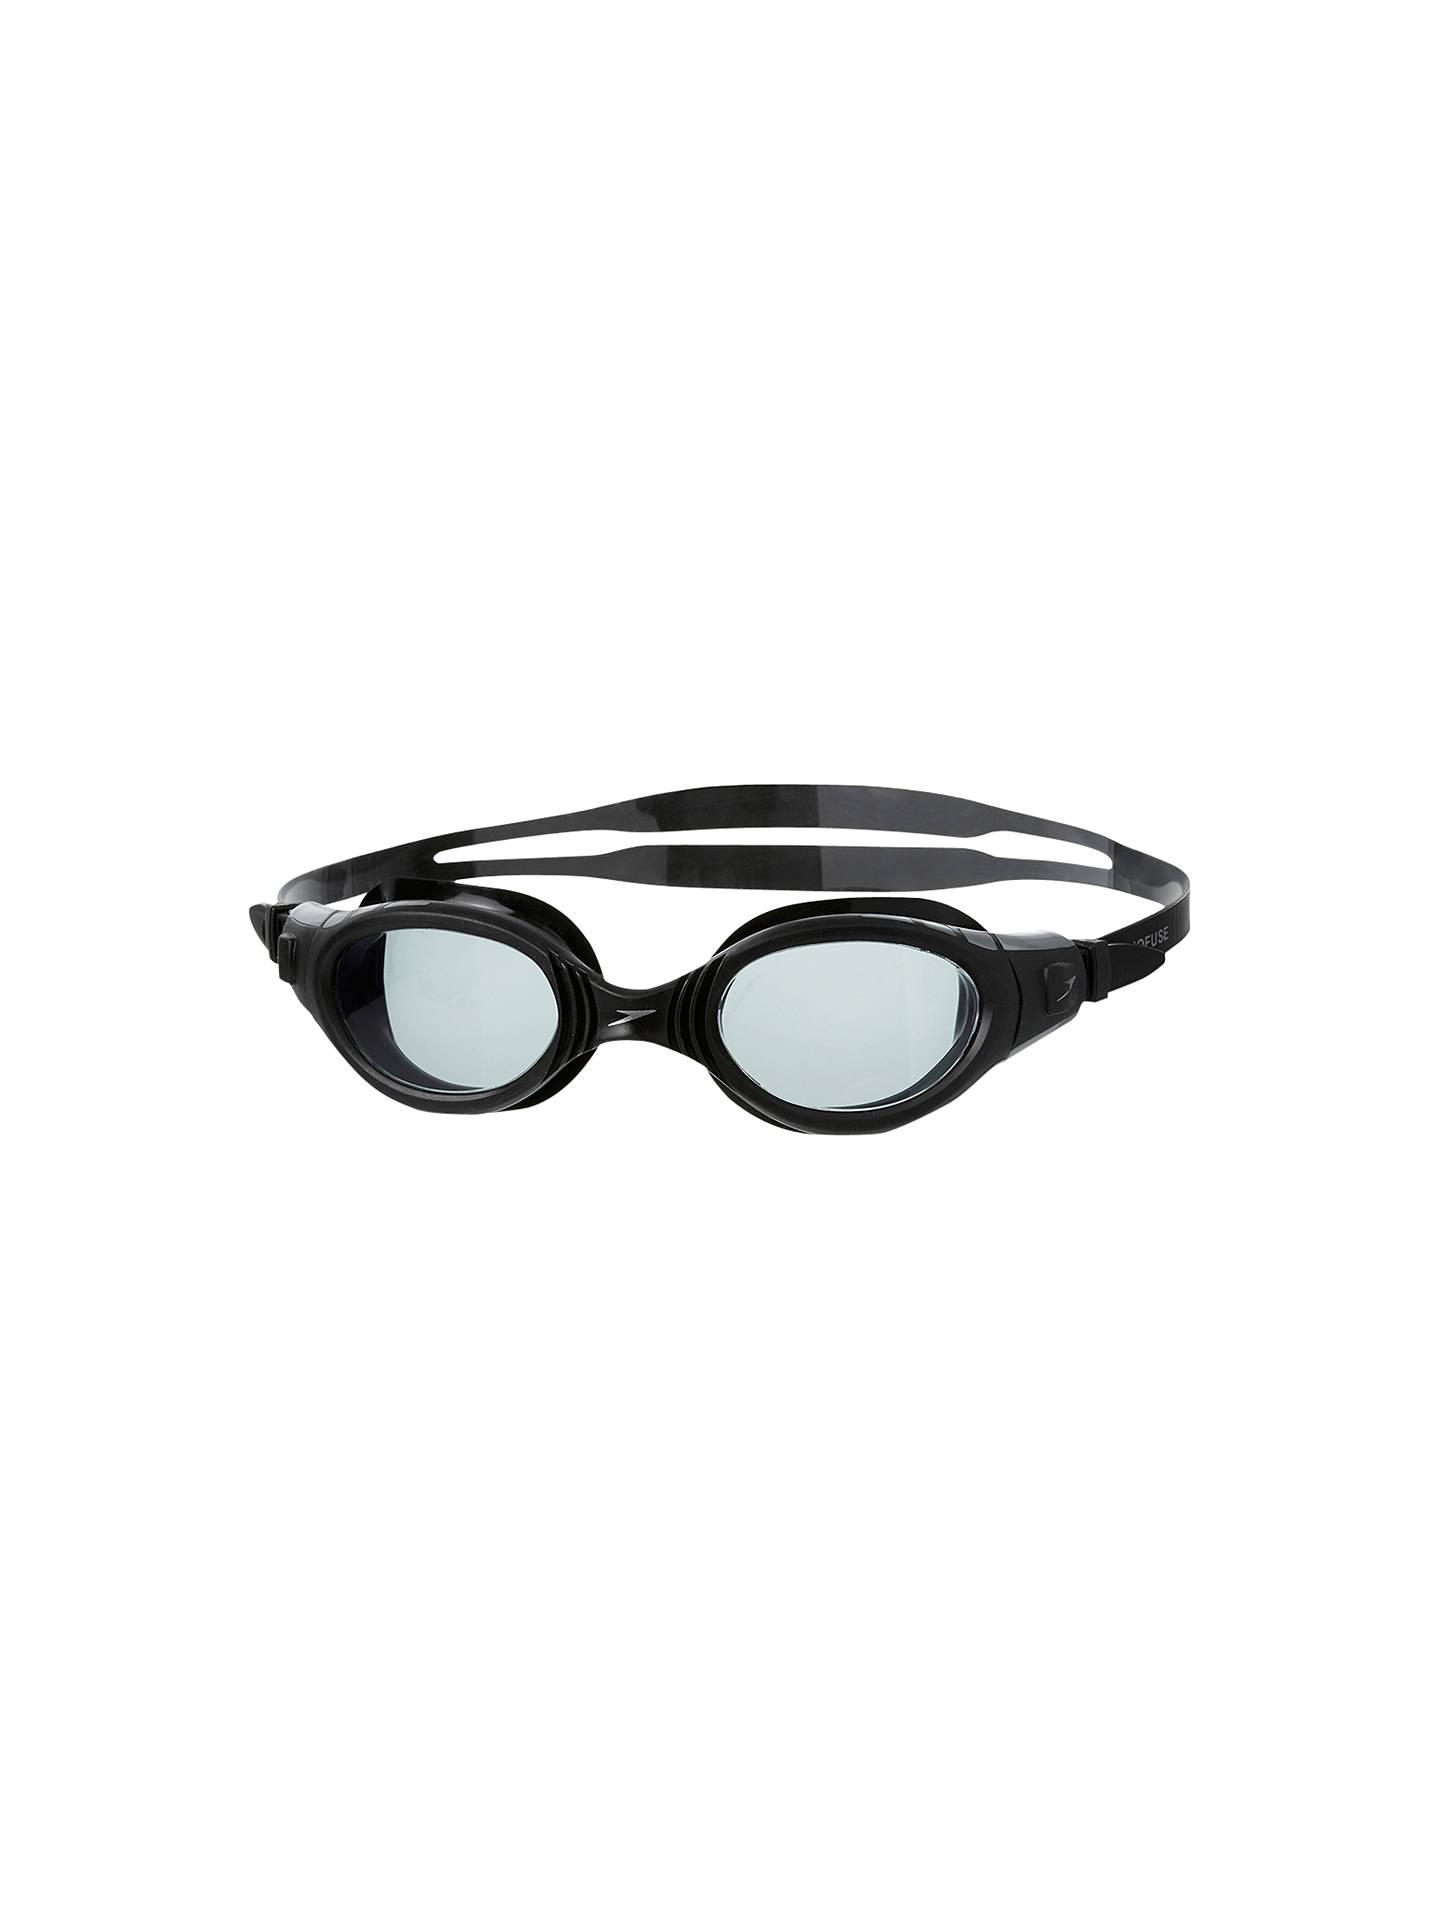 cf518380f9b0 Buy Speedo Futura Biofuse Goggles